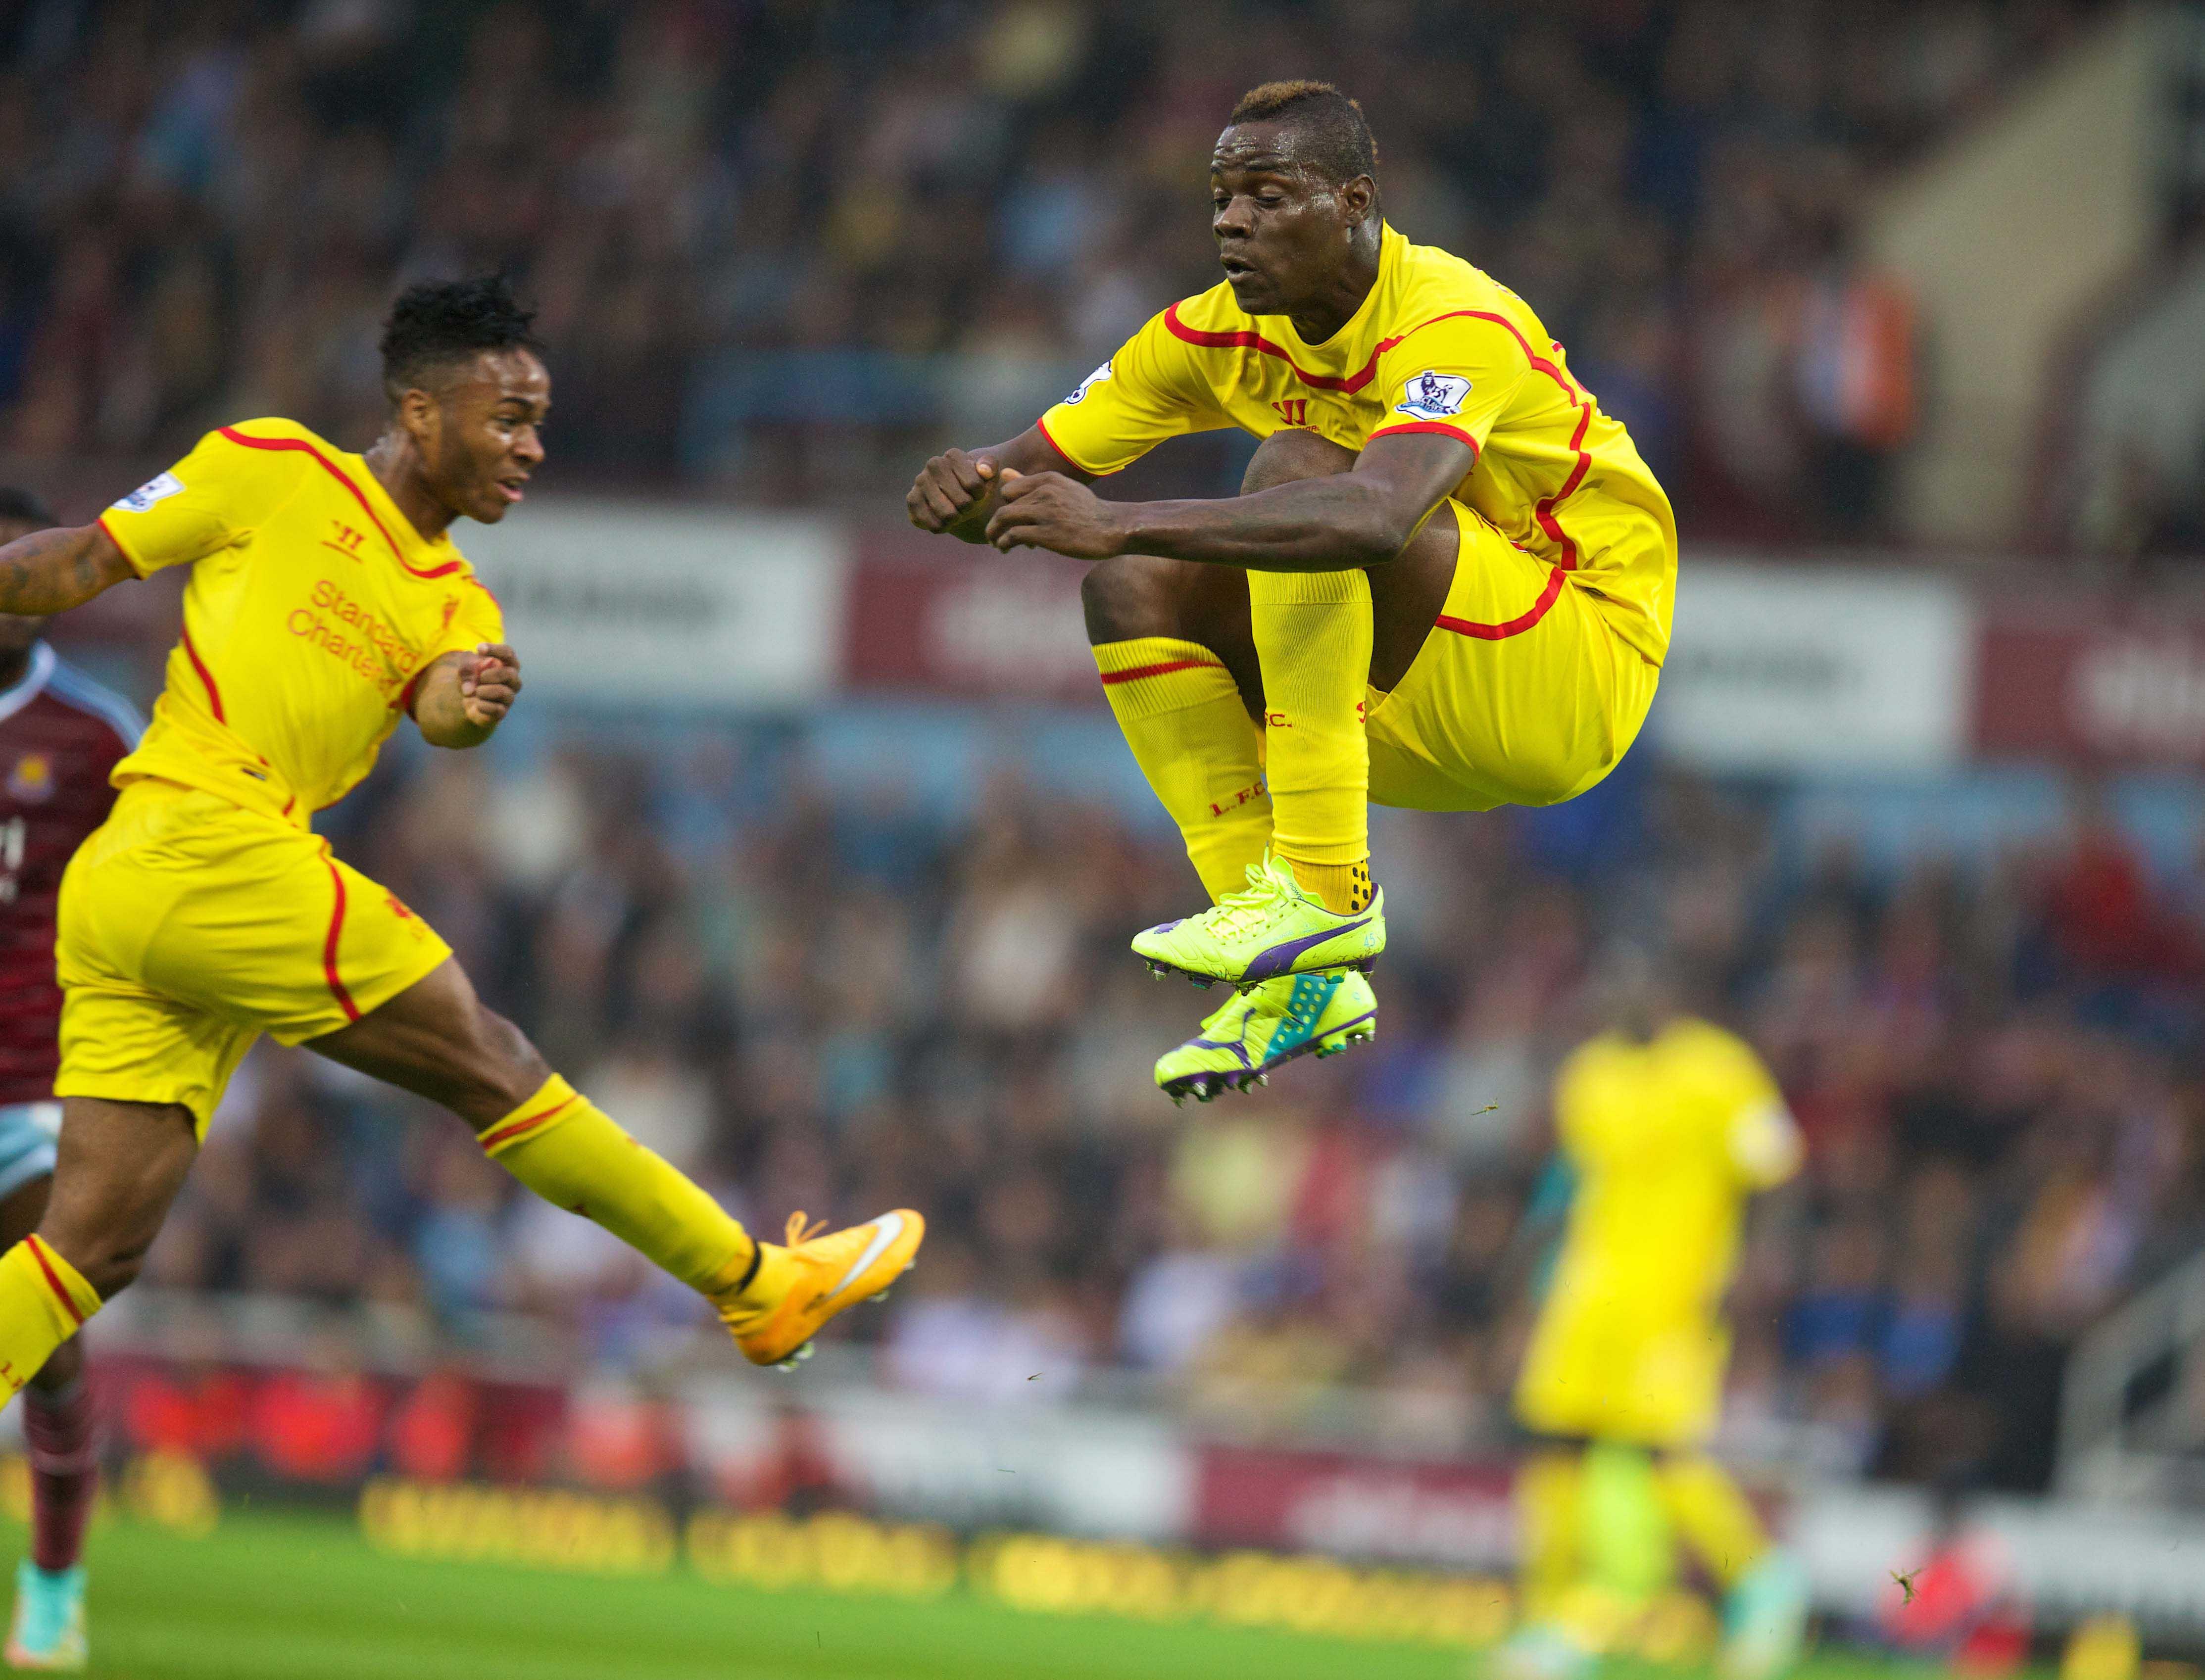 Football - FA Premier League - West Ham United FC v Liverpool FC